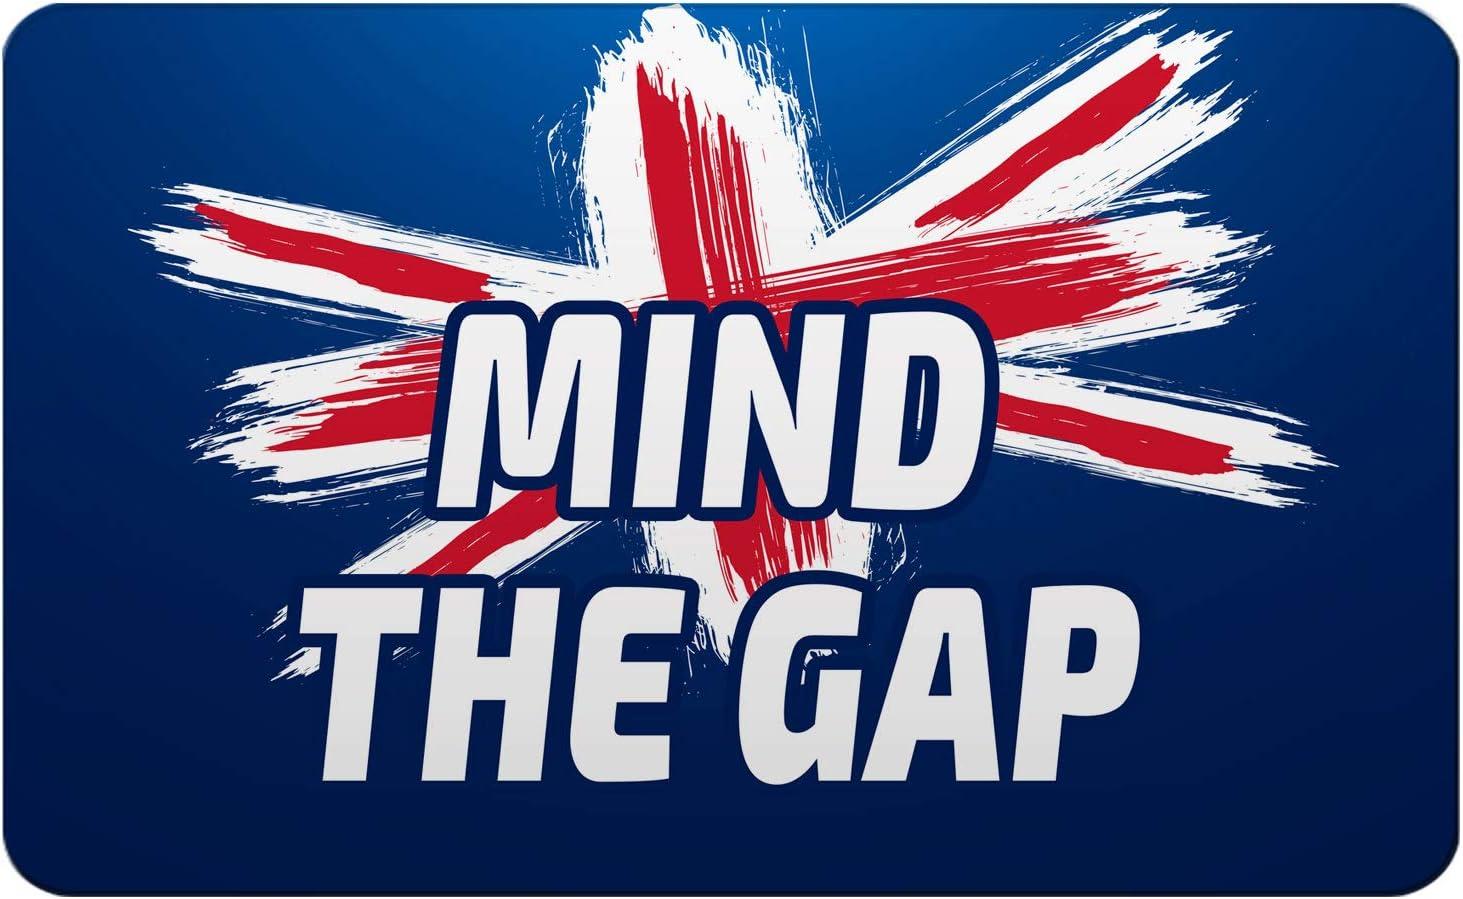 Makoroni - MIND THE GAP British England UK Des#2 Refrigerator Wall Magnet 2.75x3.5 inc